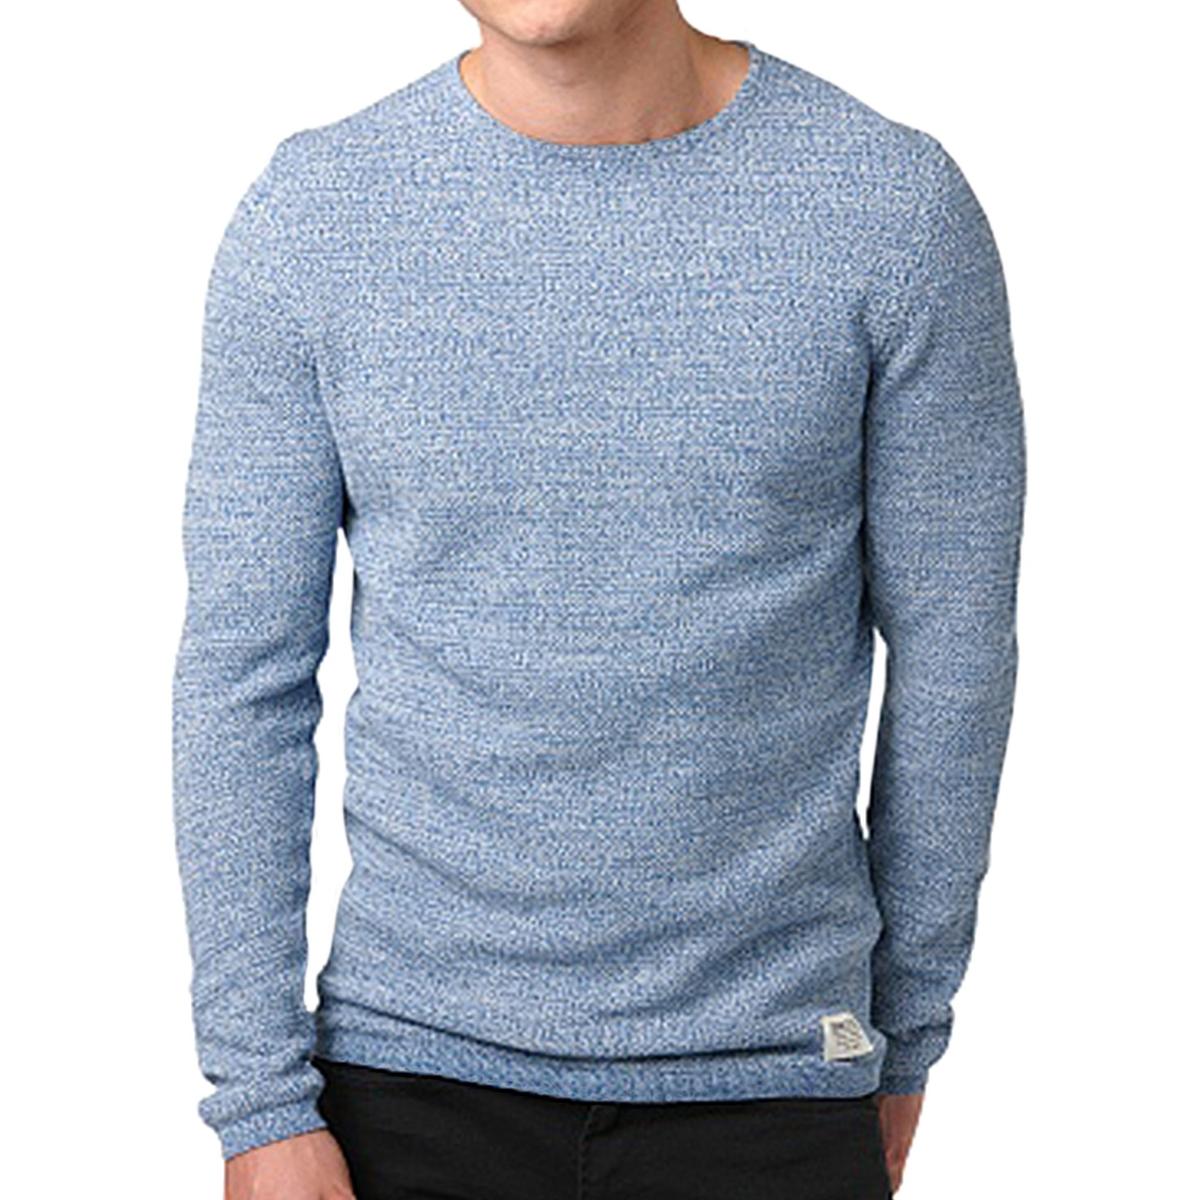 Пуловер хлопковый из трикотажа-мулине